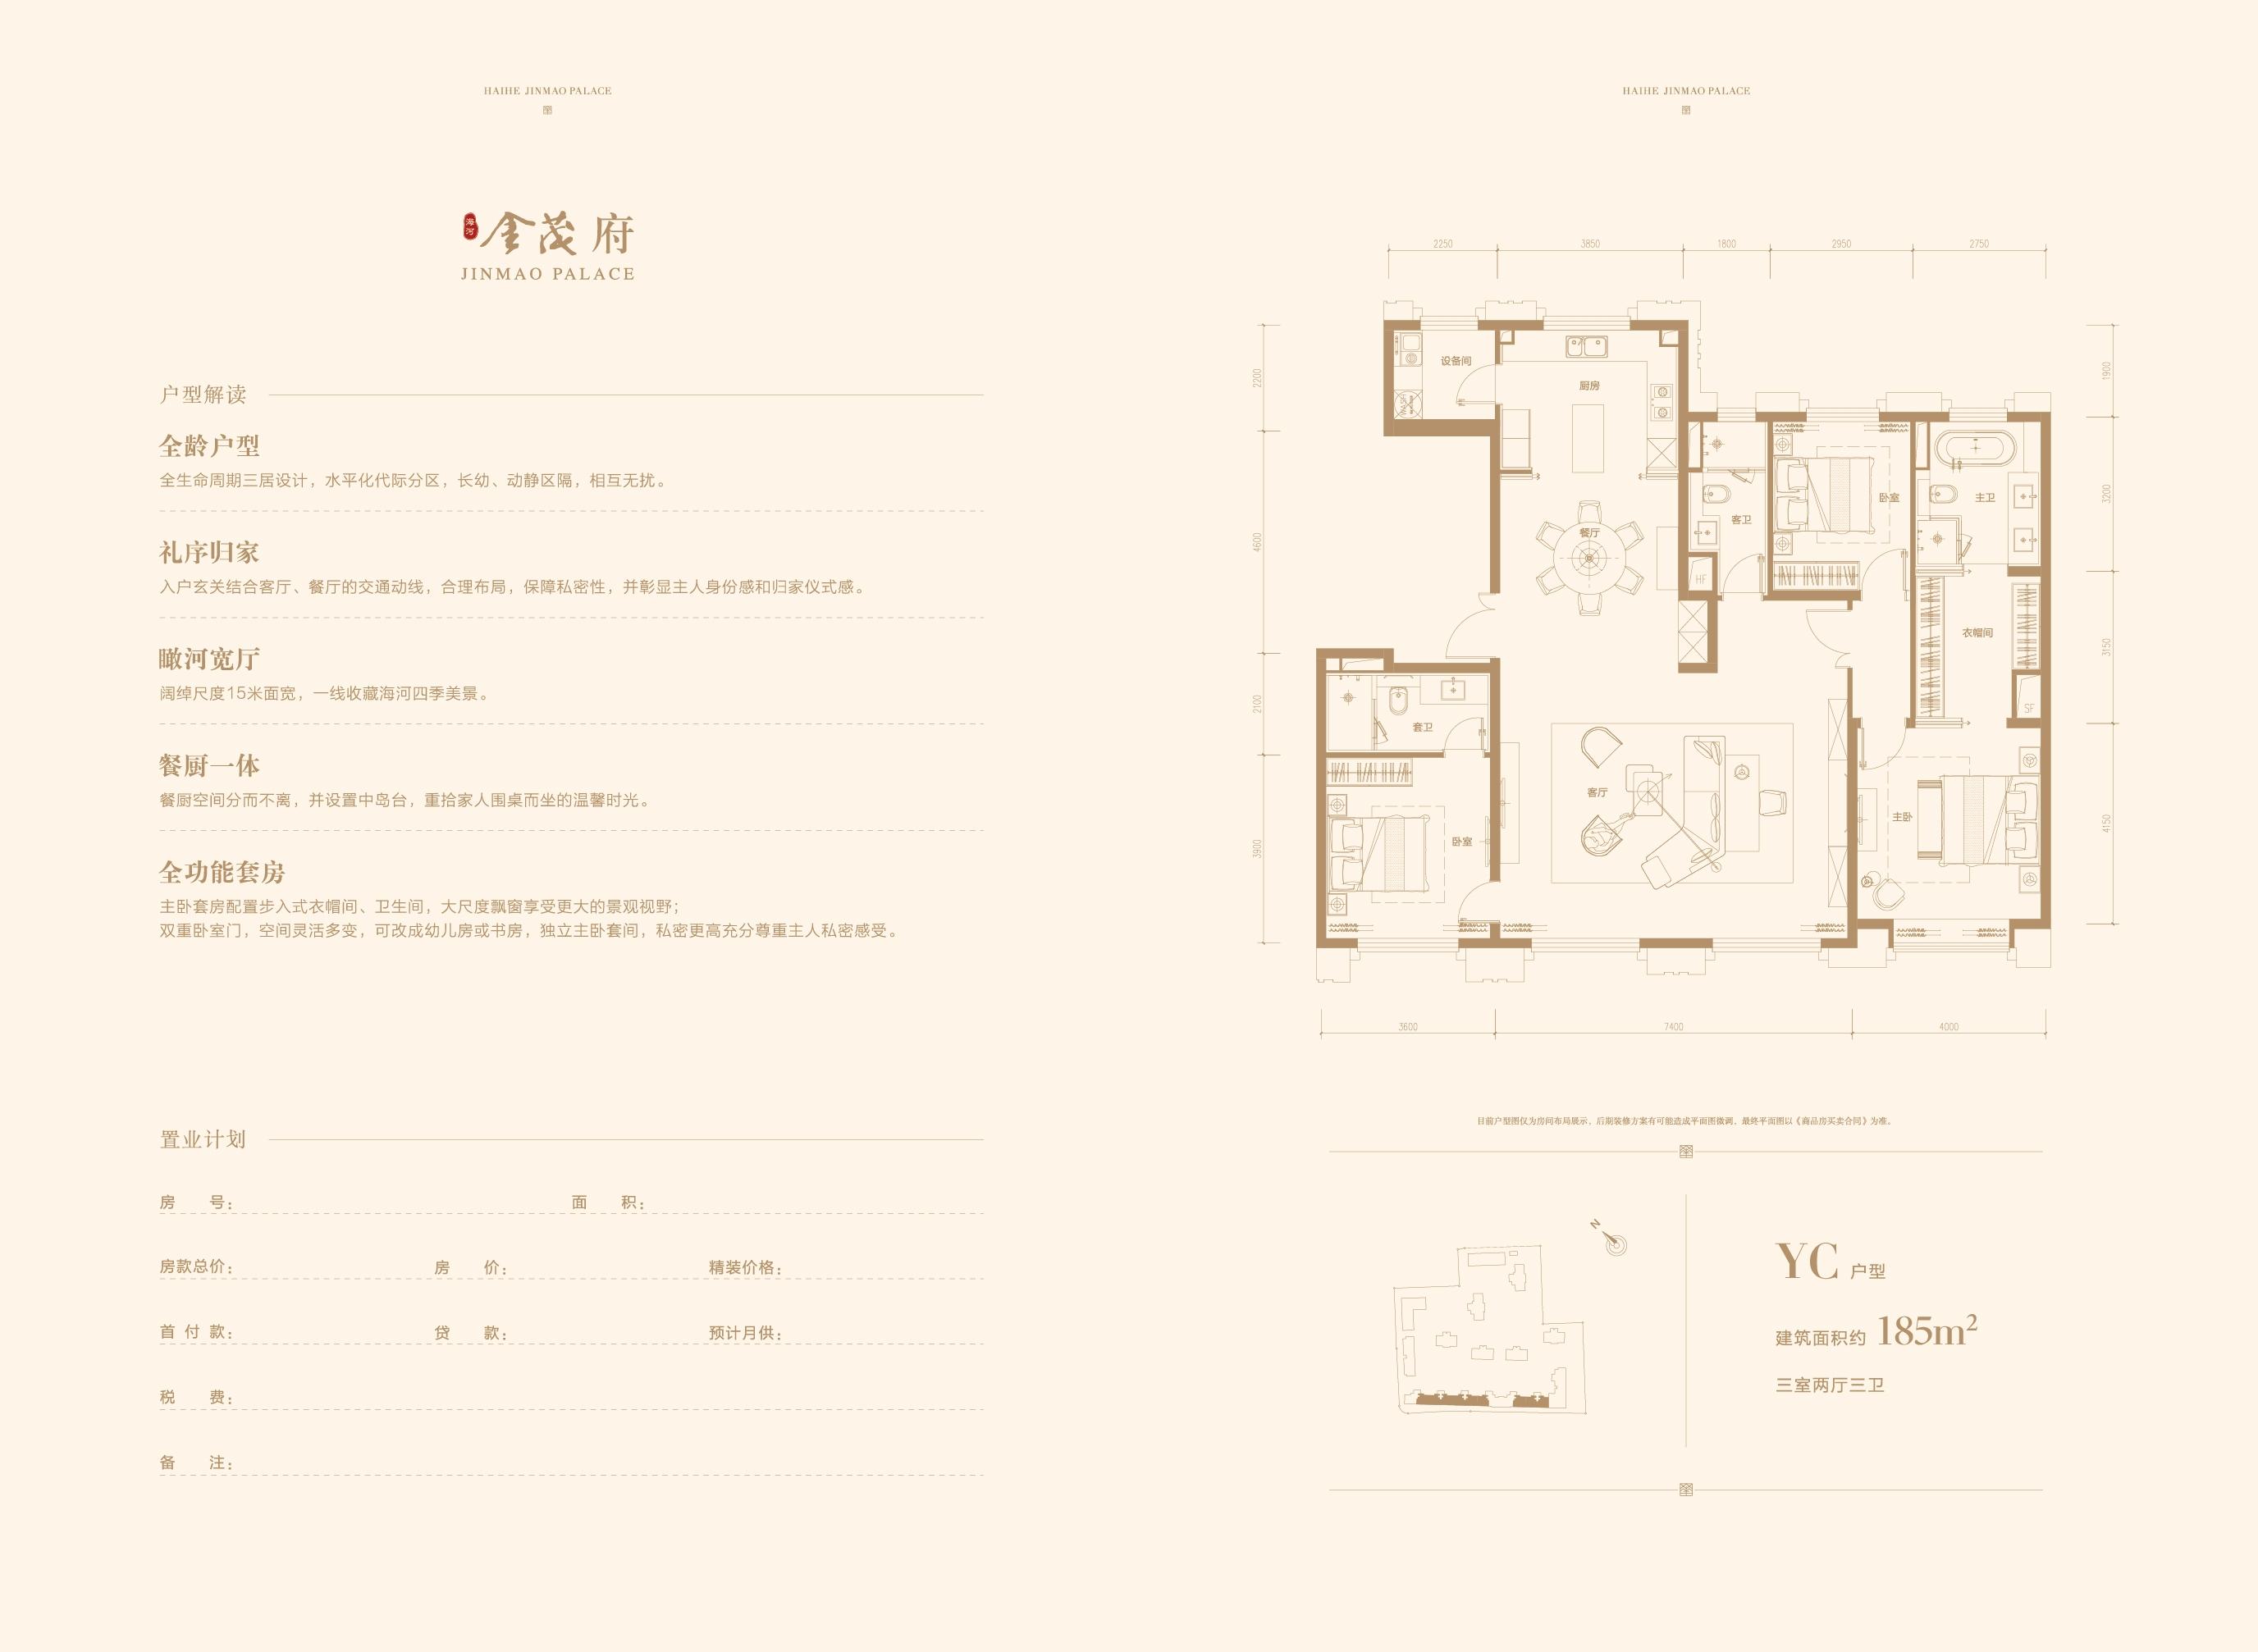 YC户型 洋房185平米三室两厅三位